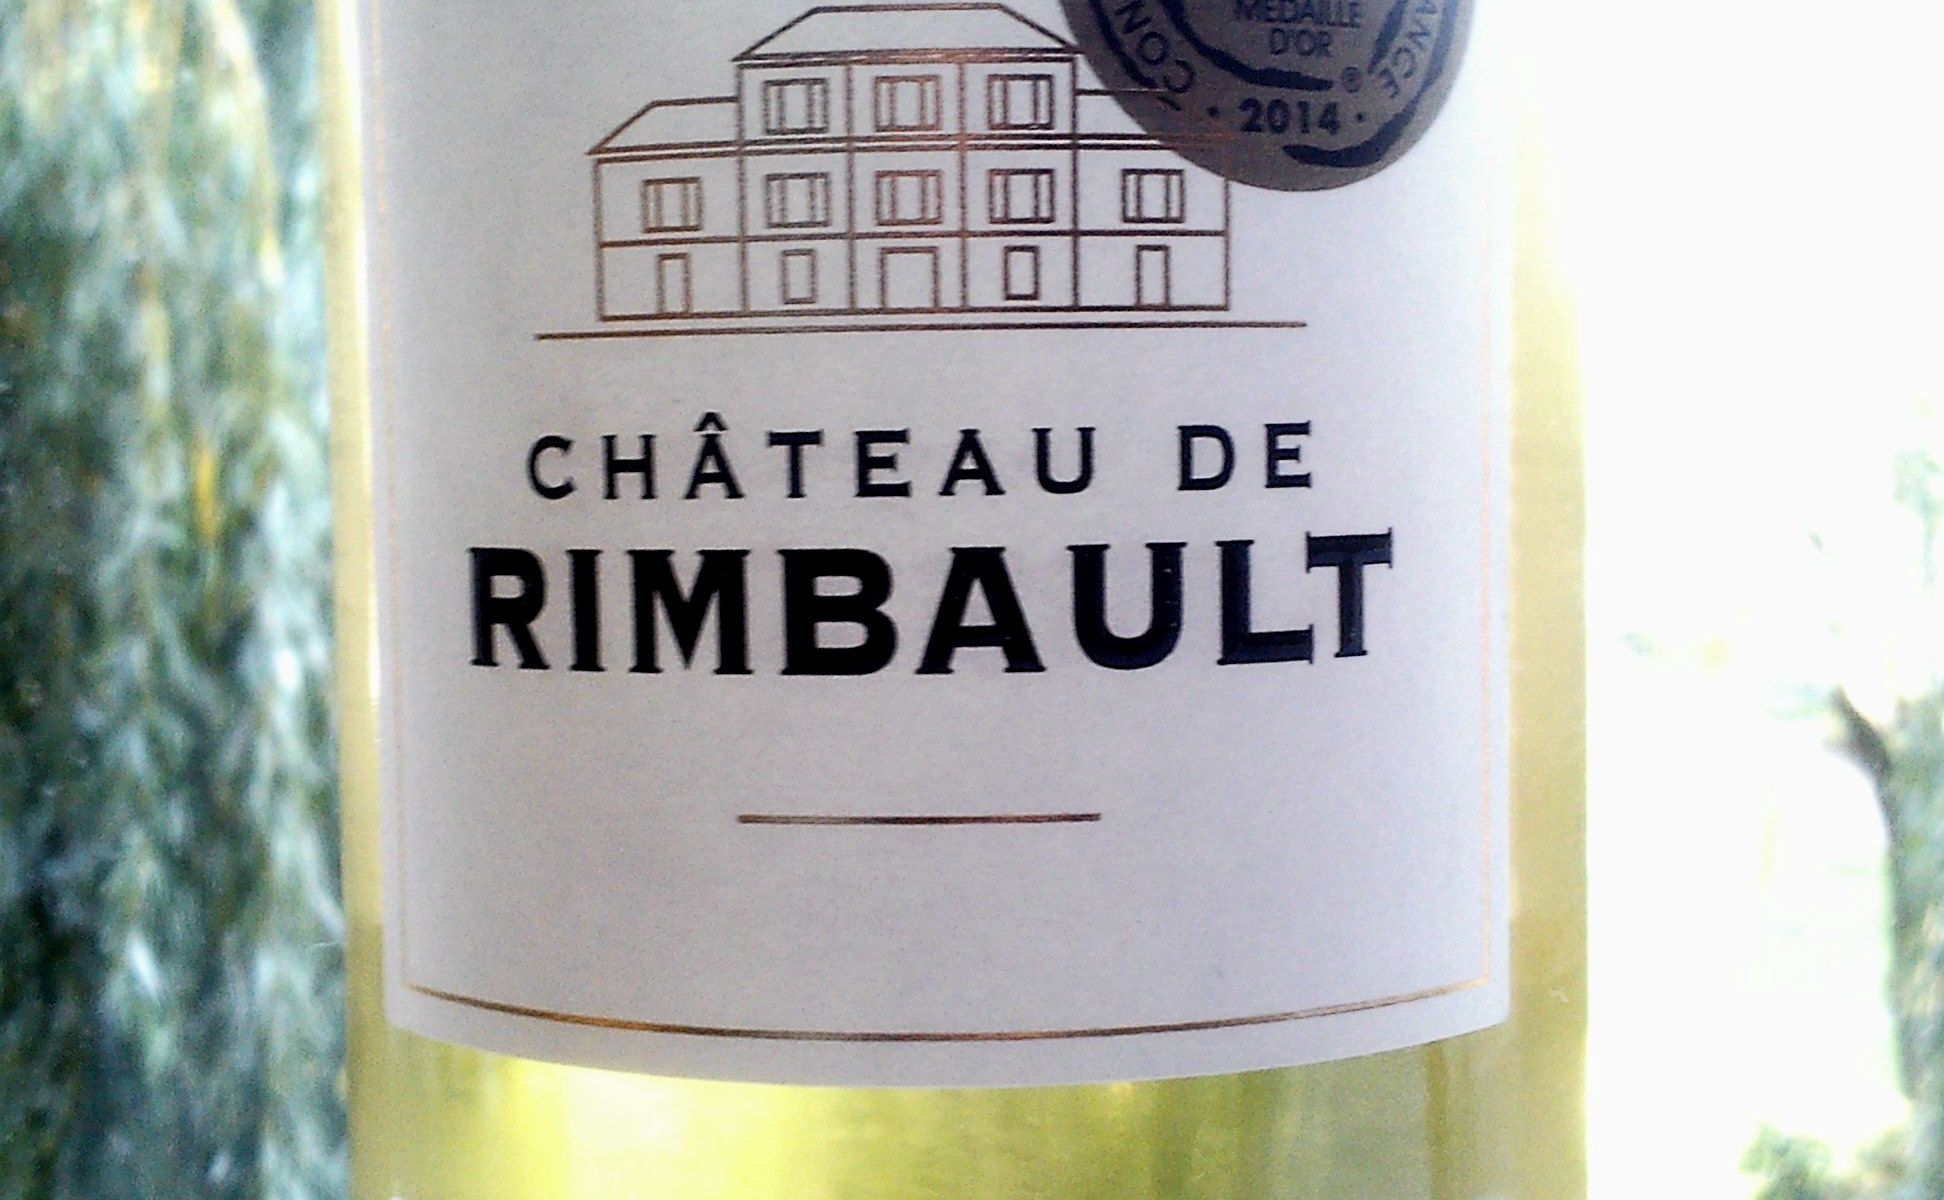 Château de Rimbault Muscat de Frontignan